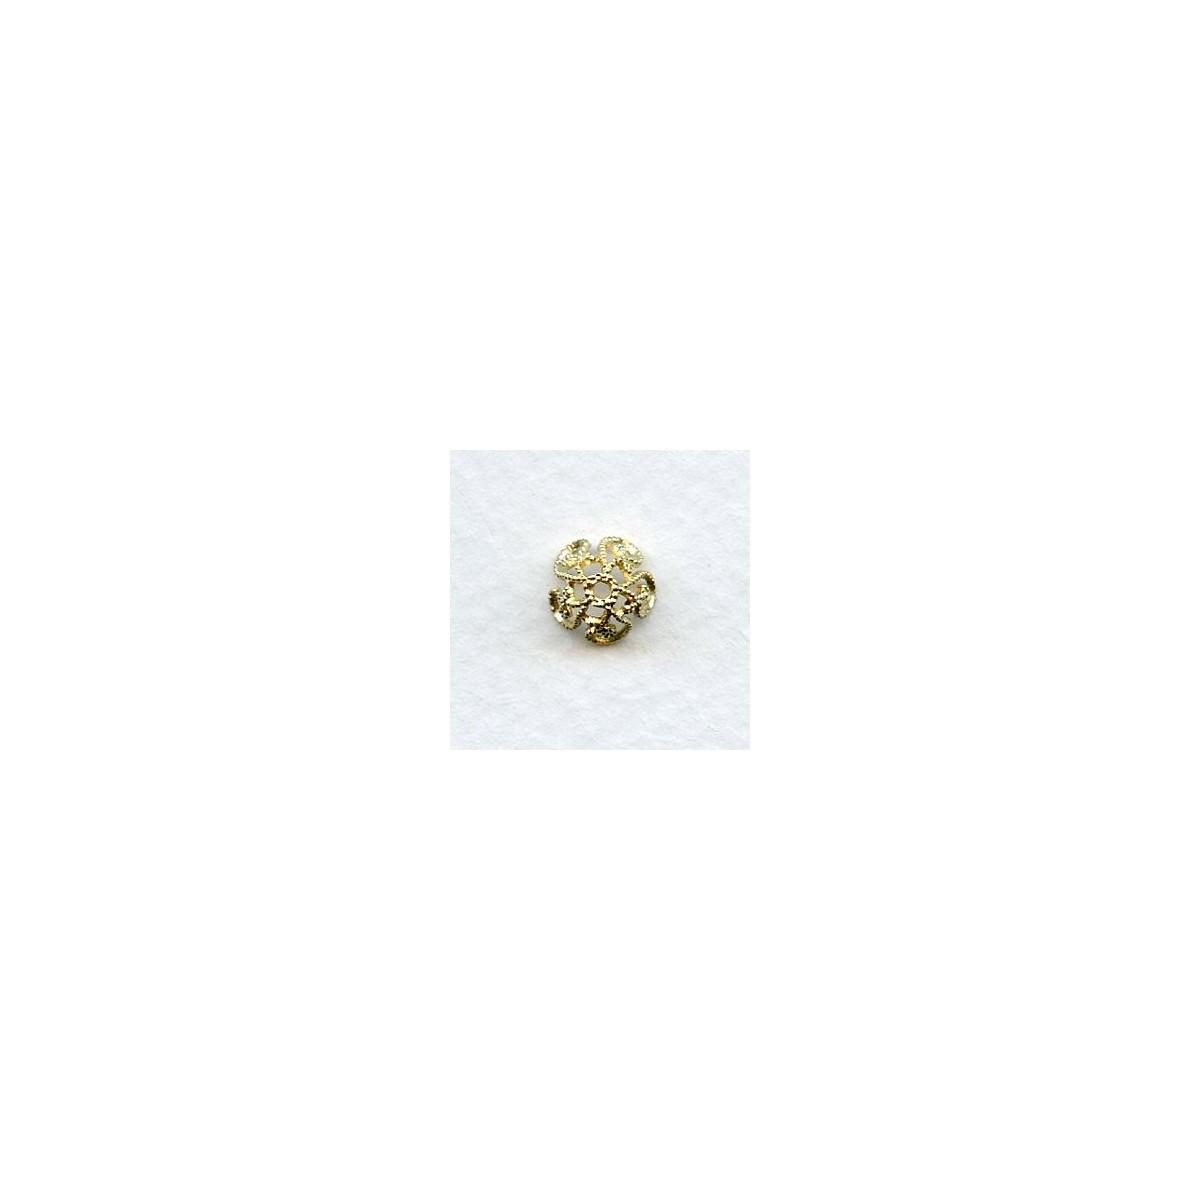 Victorian Style Filigree Bead Caps in Raw Brass